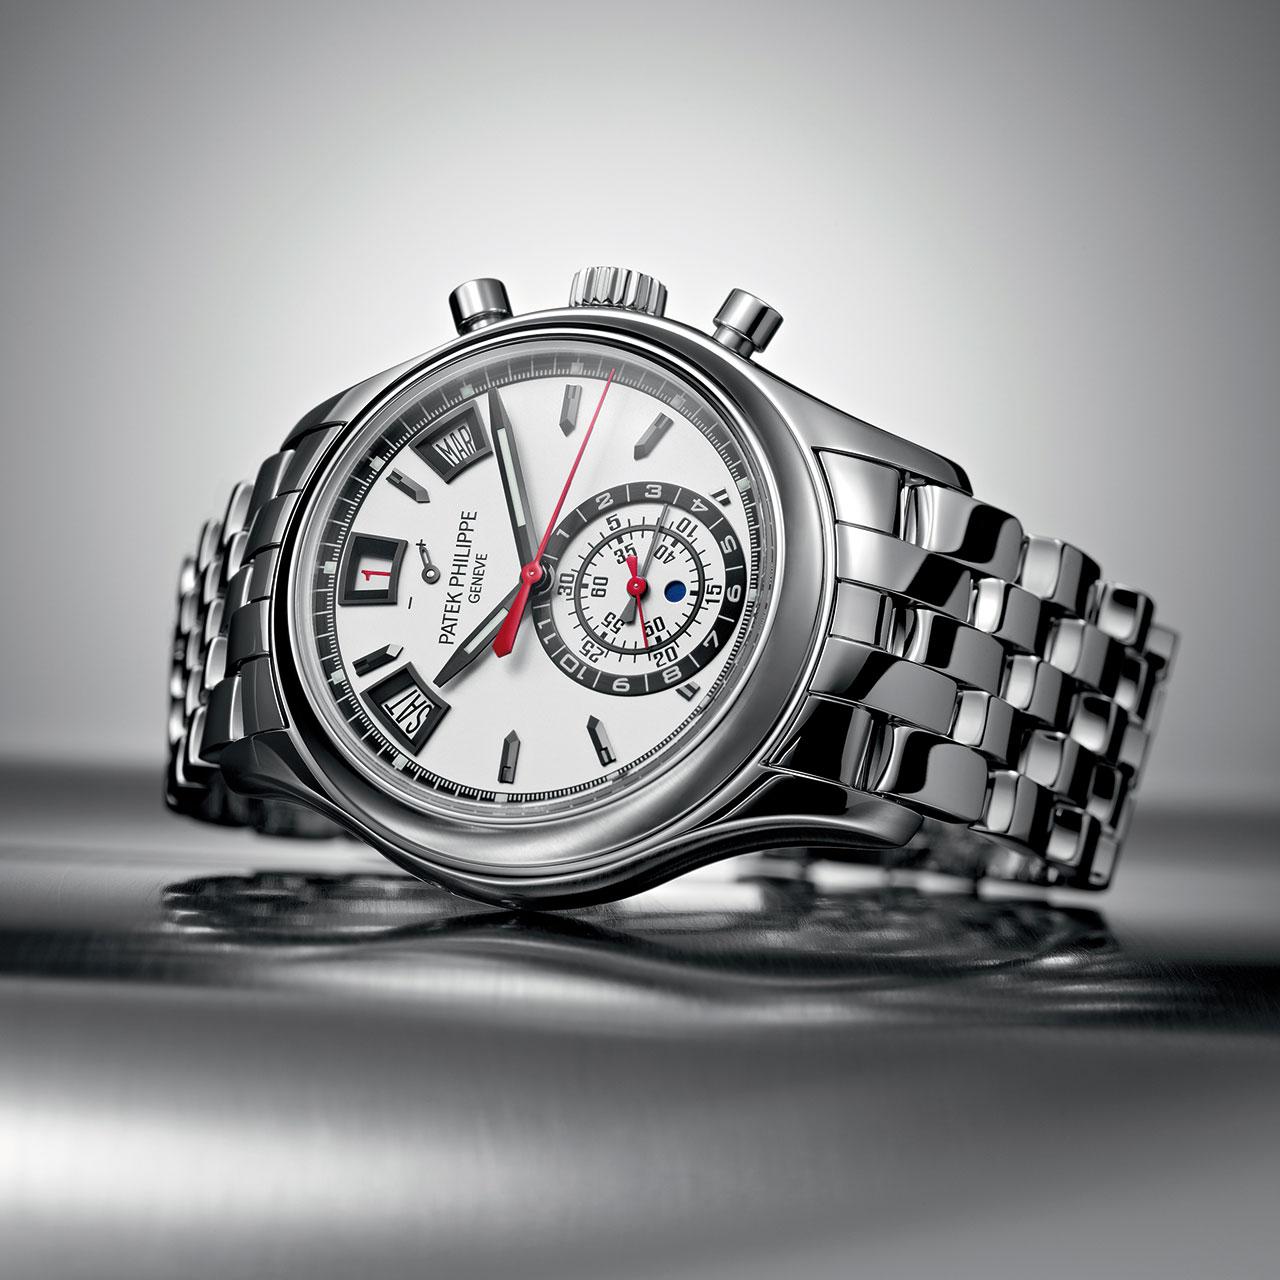 Patek Philippe Annual Calendar Chronograph Ref. 5960/1A-001 Automatic Watch